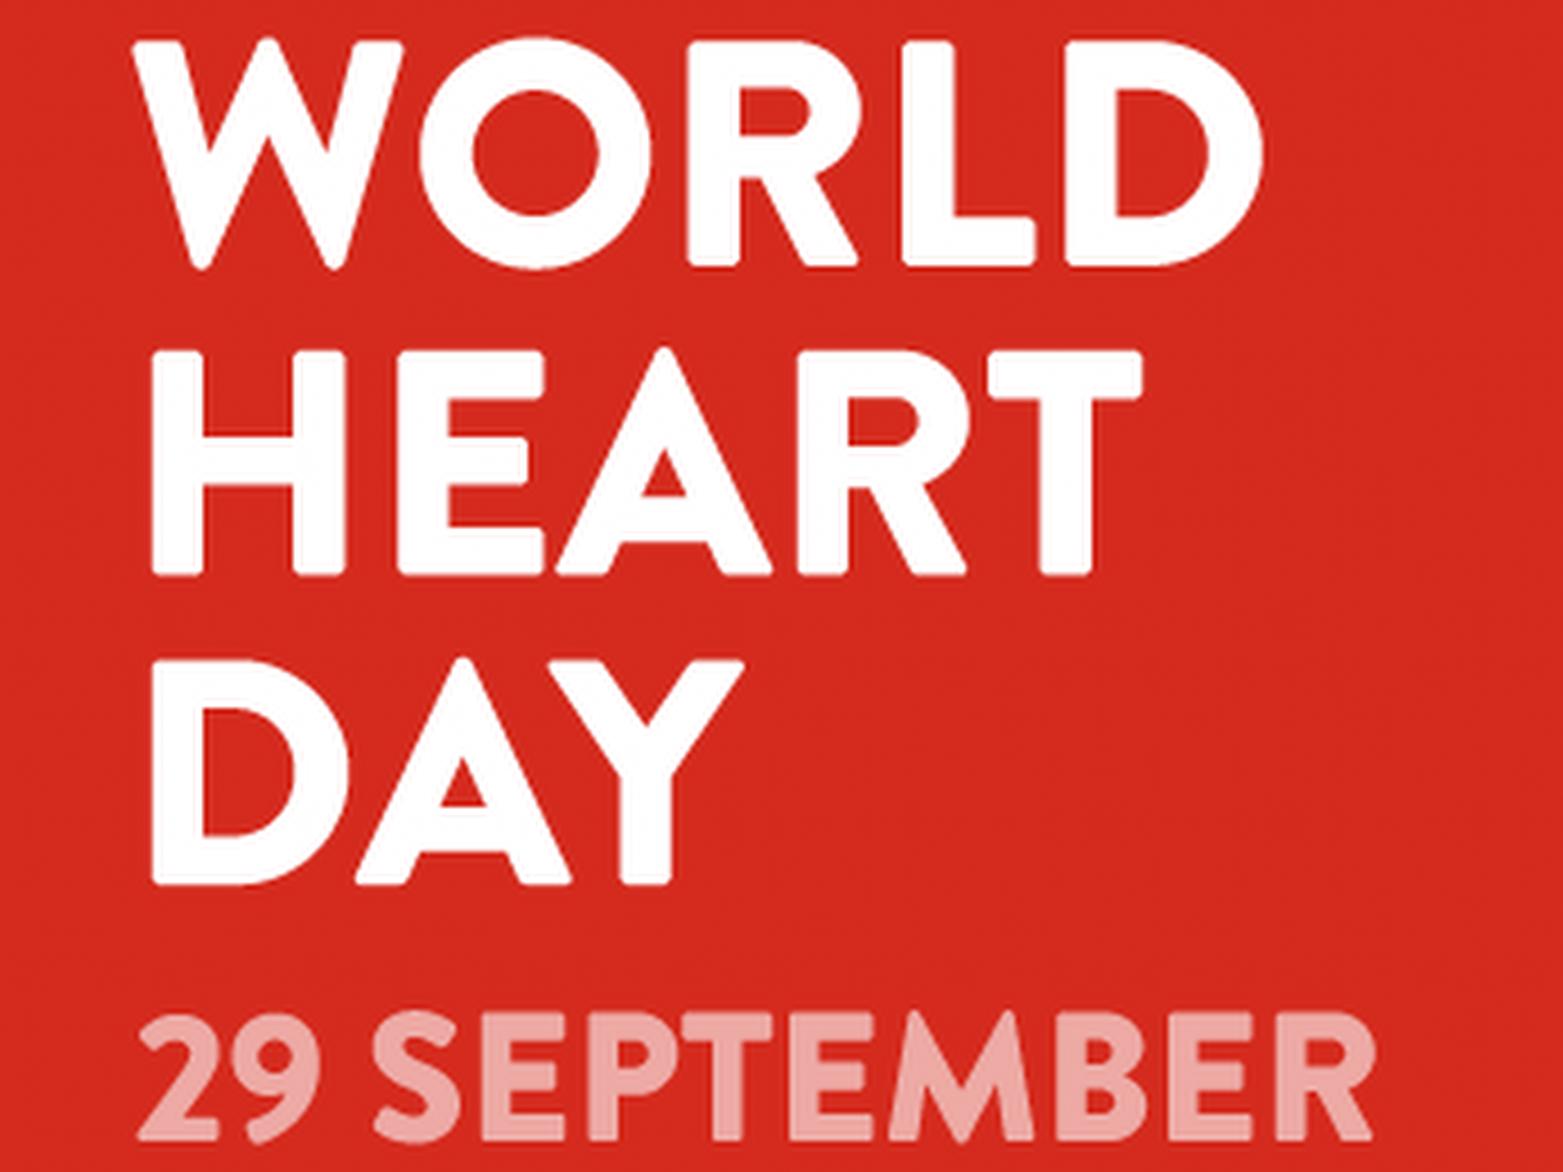 RESOURCE: World Heart Day, 29 September